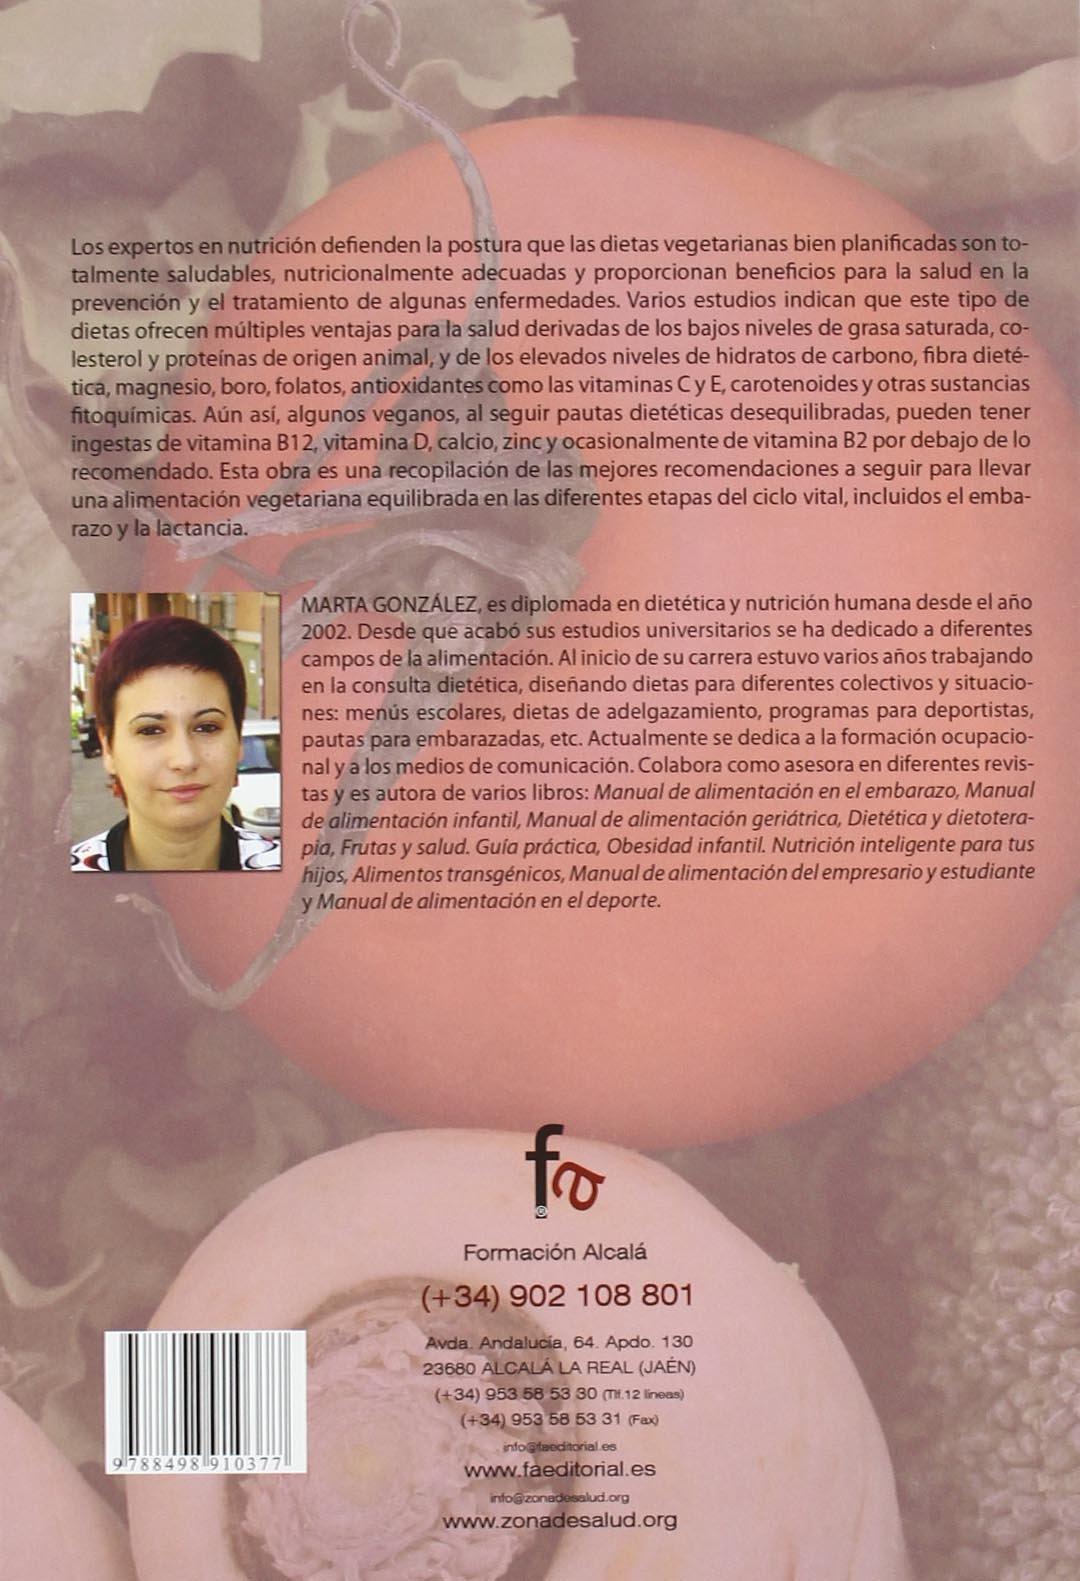 Alimentacion vegetariana sana y practa (Spanish Edition): Marta Gonzalez Caballero: 9788498910377: Amazon.com: Books